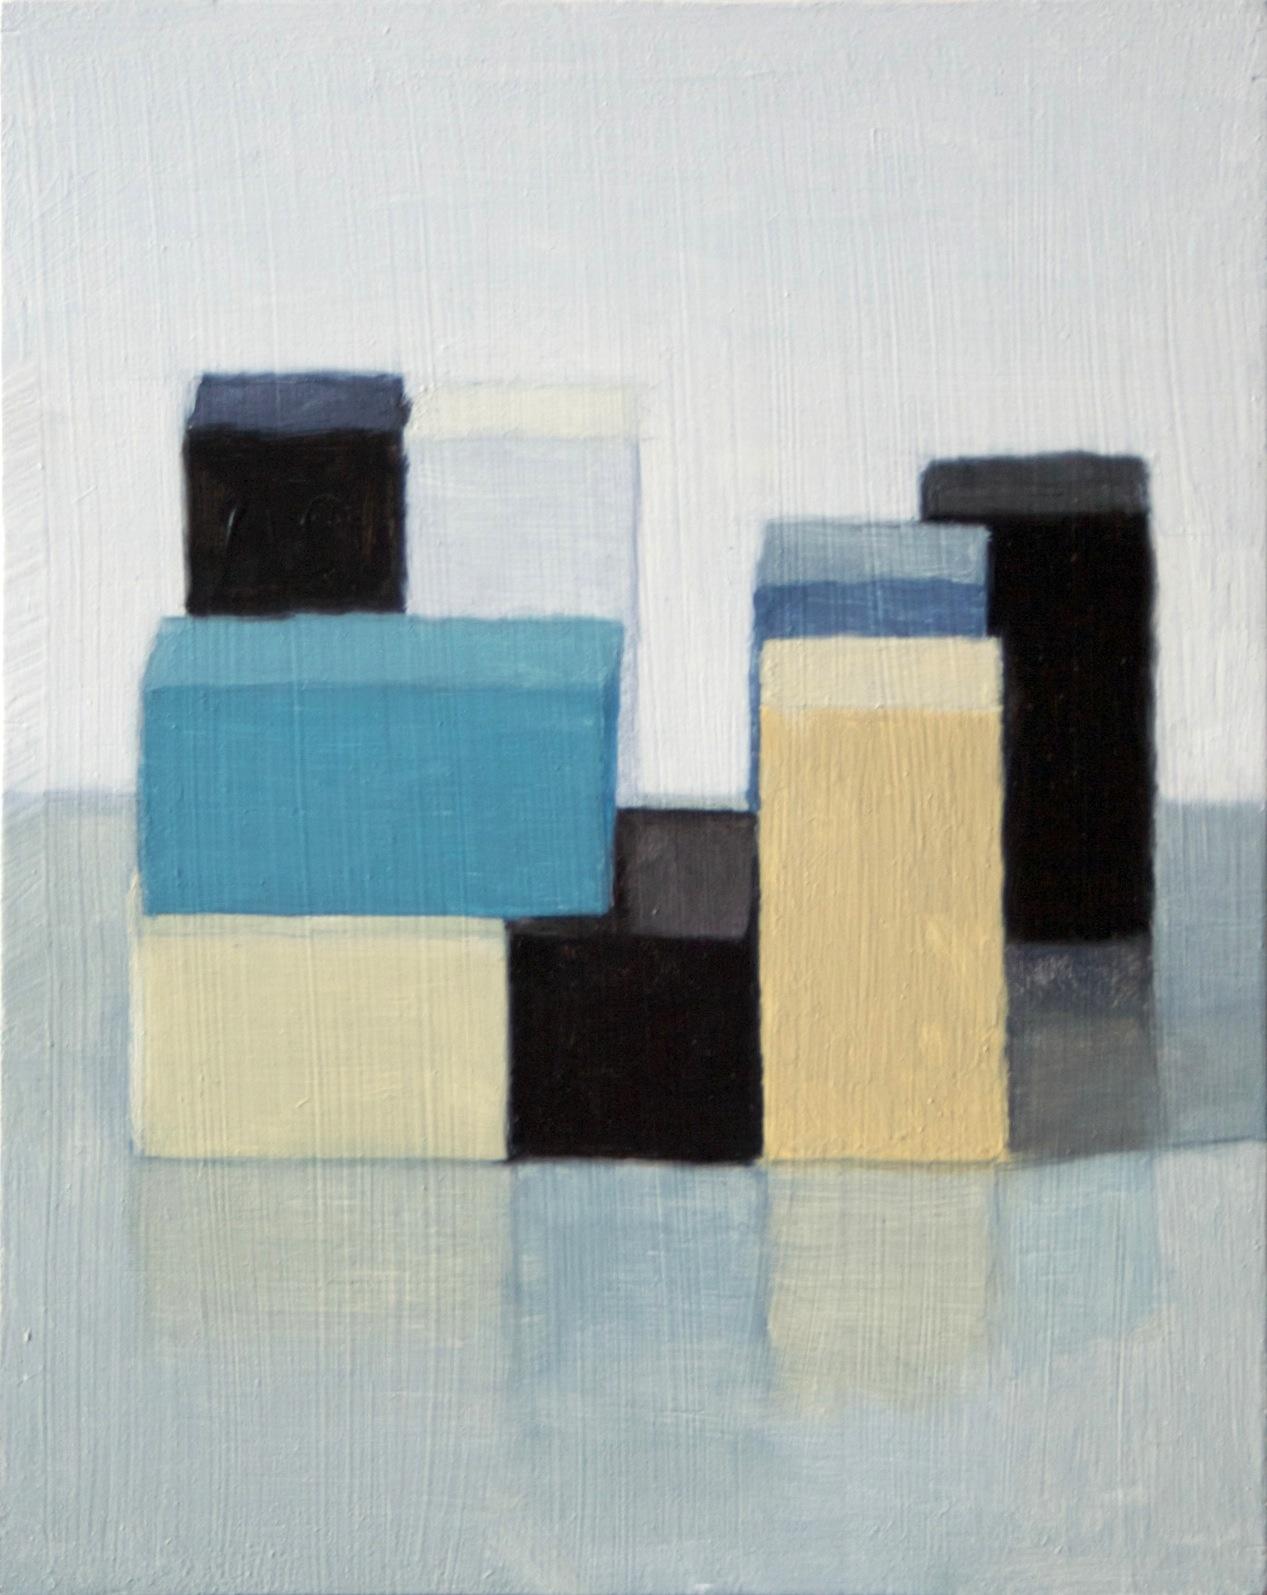 IM1303 Painted Blocks #XX (IM1303 Cohere Blue Violet).jpg